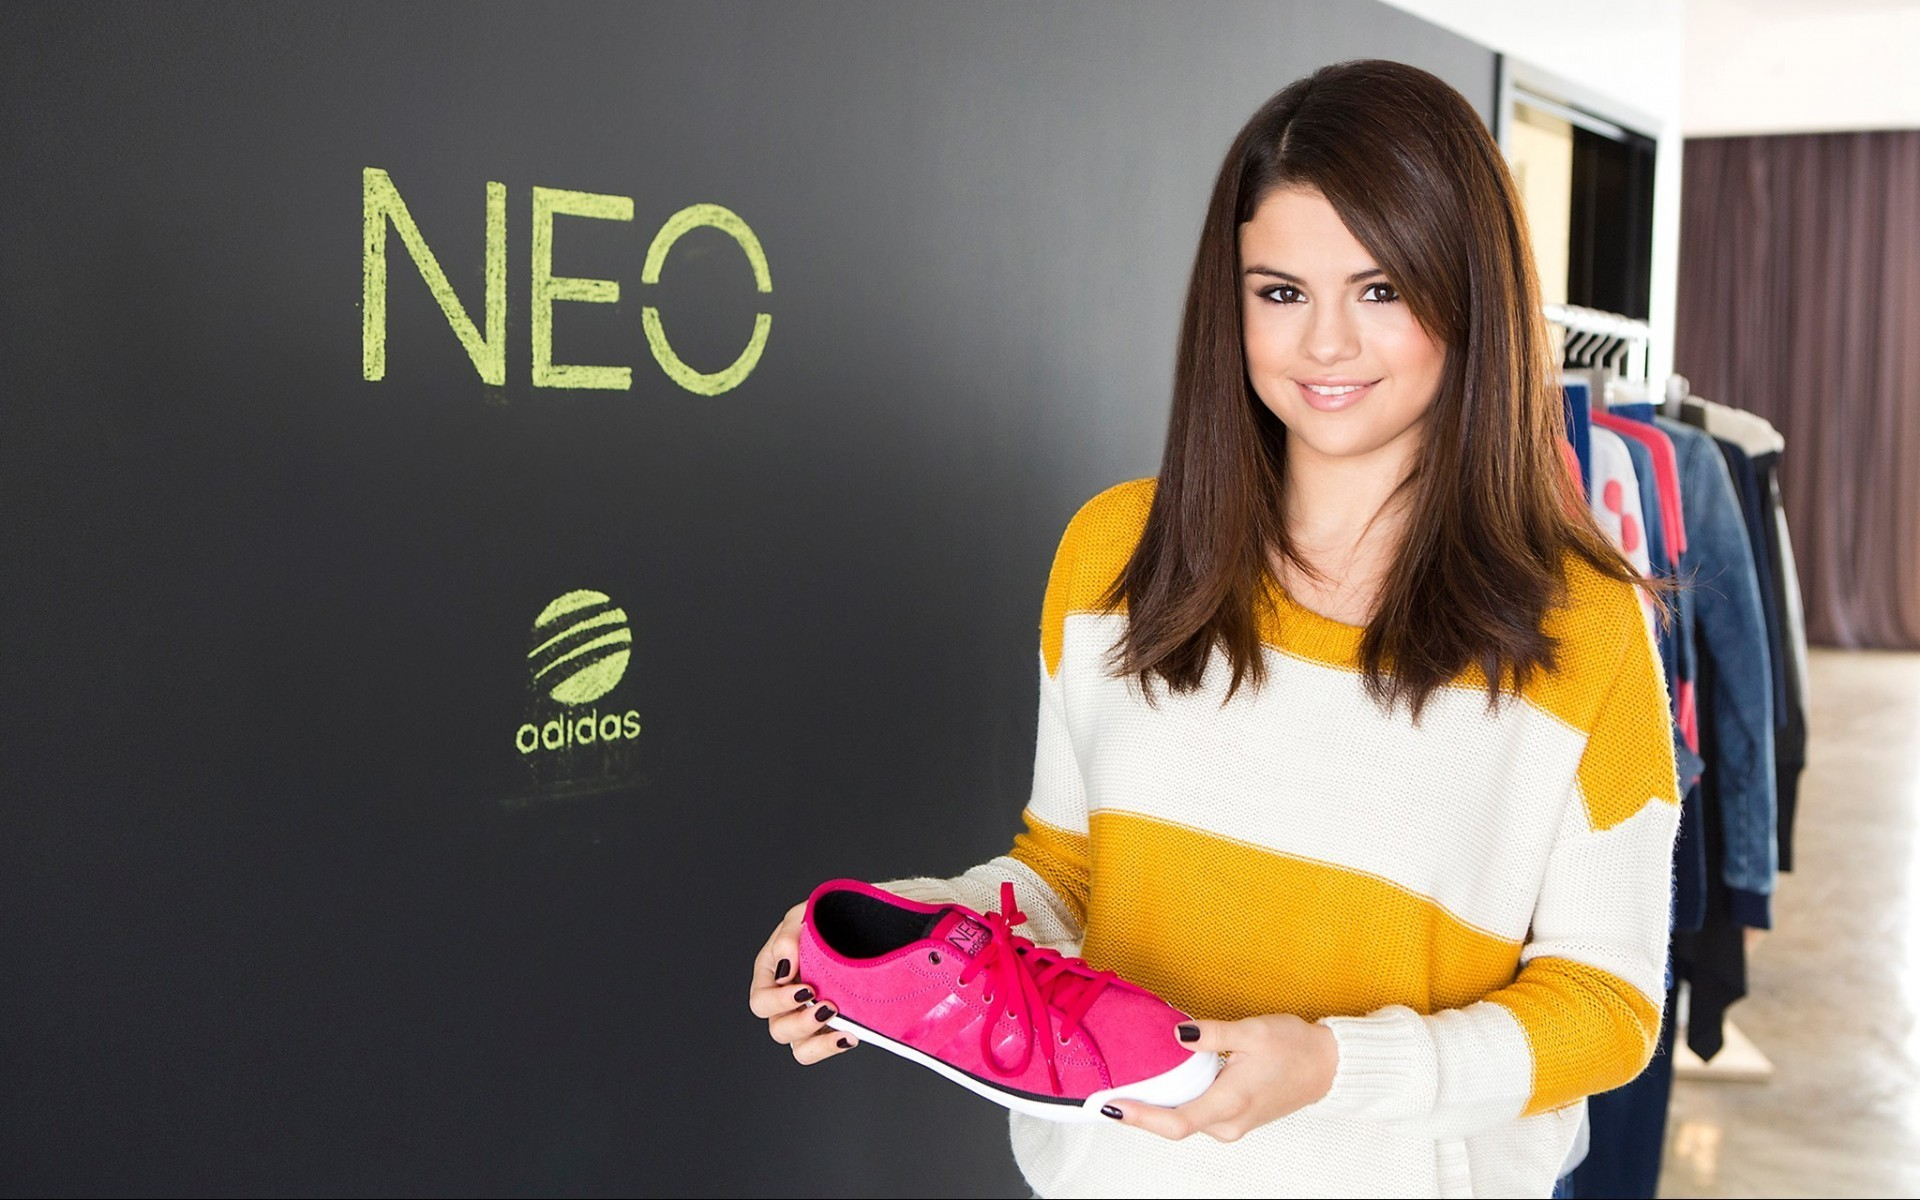 Selena Gomez Adidas Neo Shoes wallpaper 7898 1920x1200